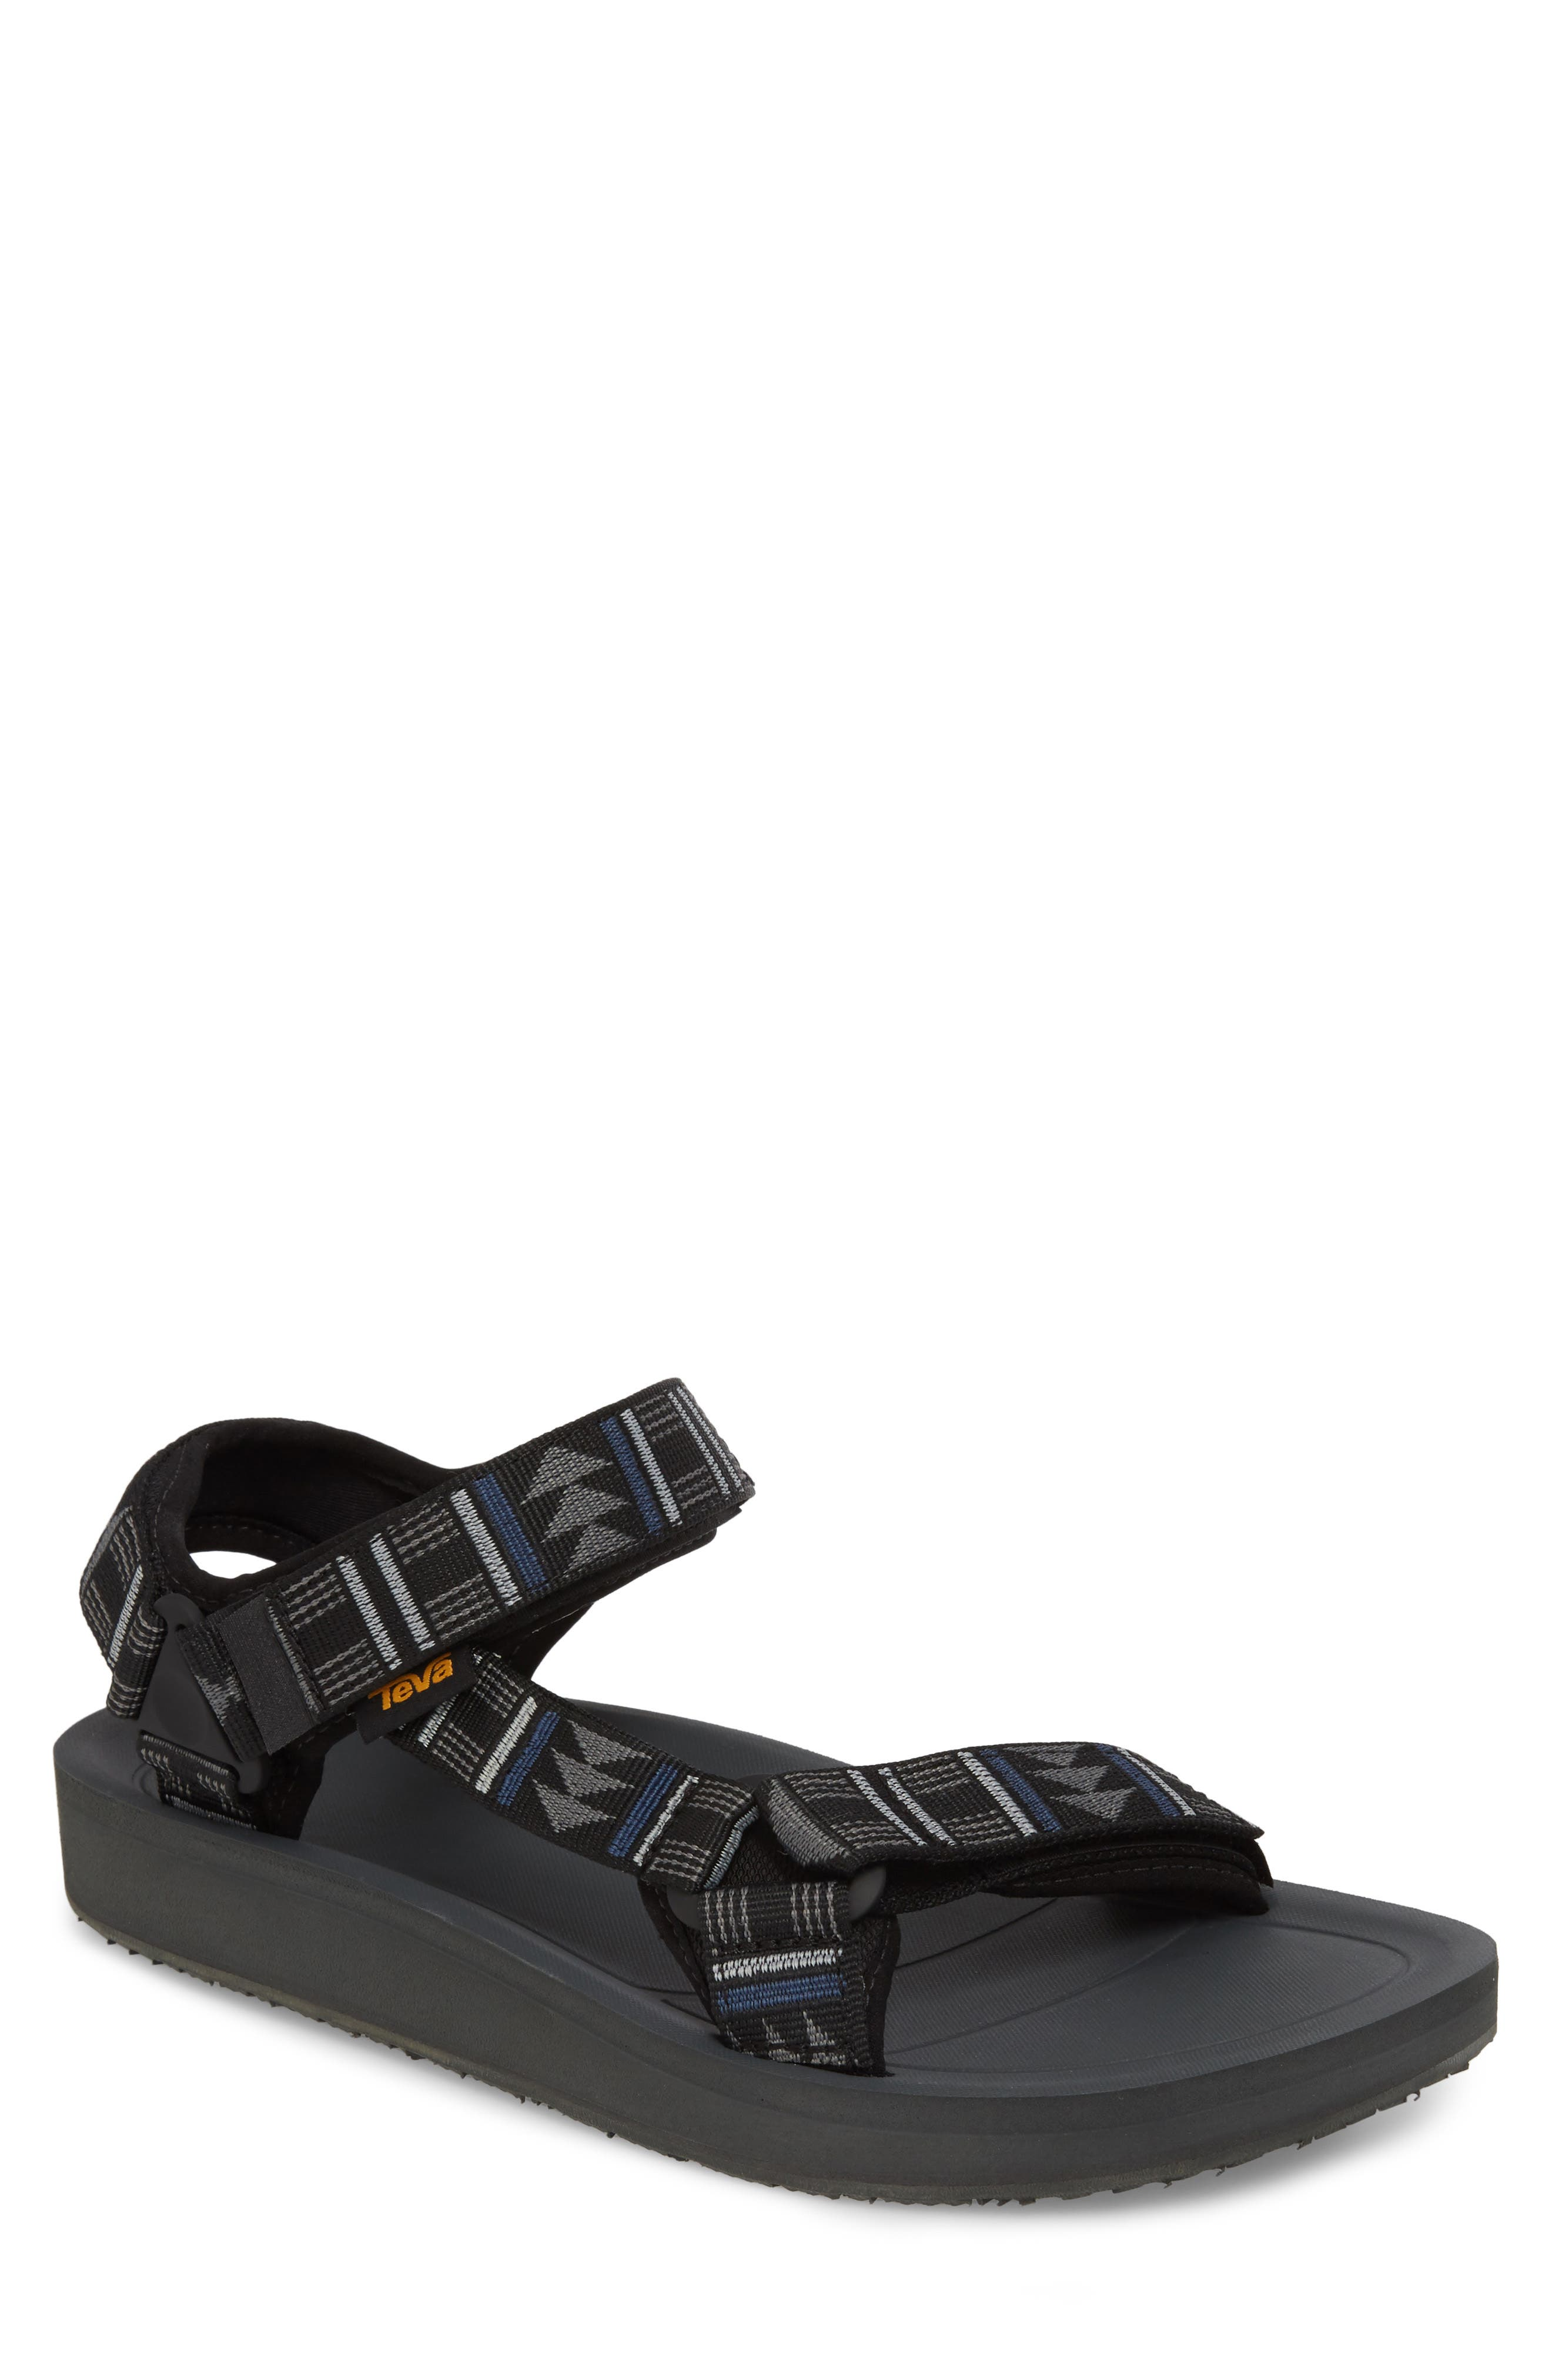 Original Universal Premier Sandal,                         Main,                         color, GREY NYLON